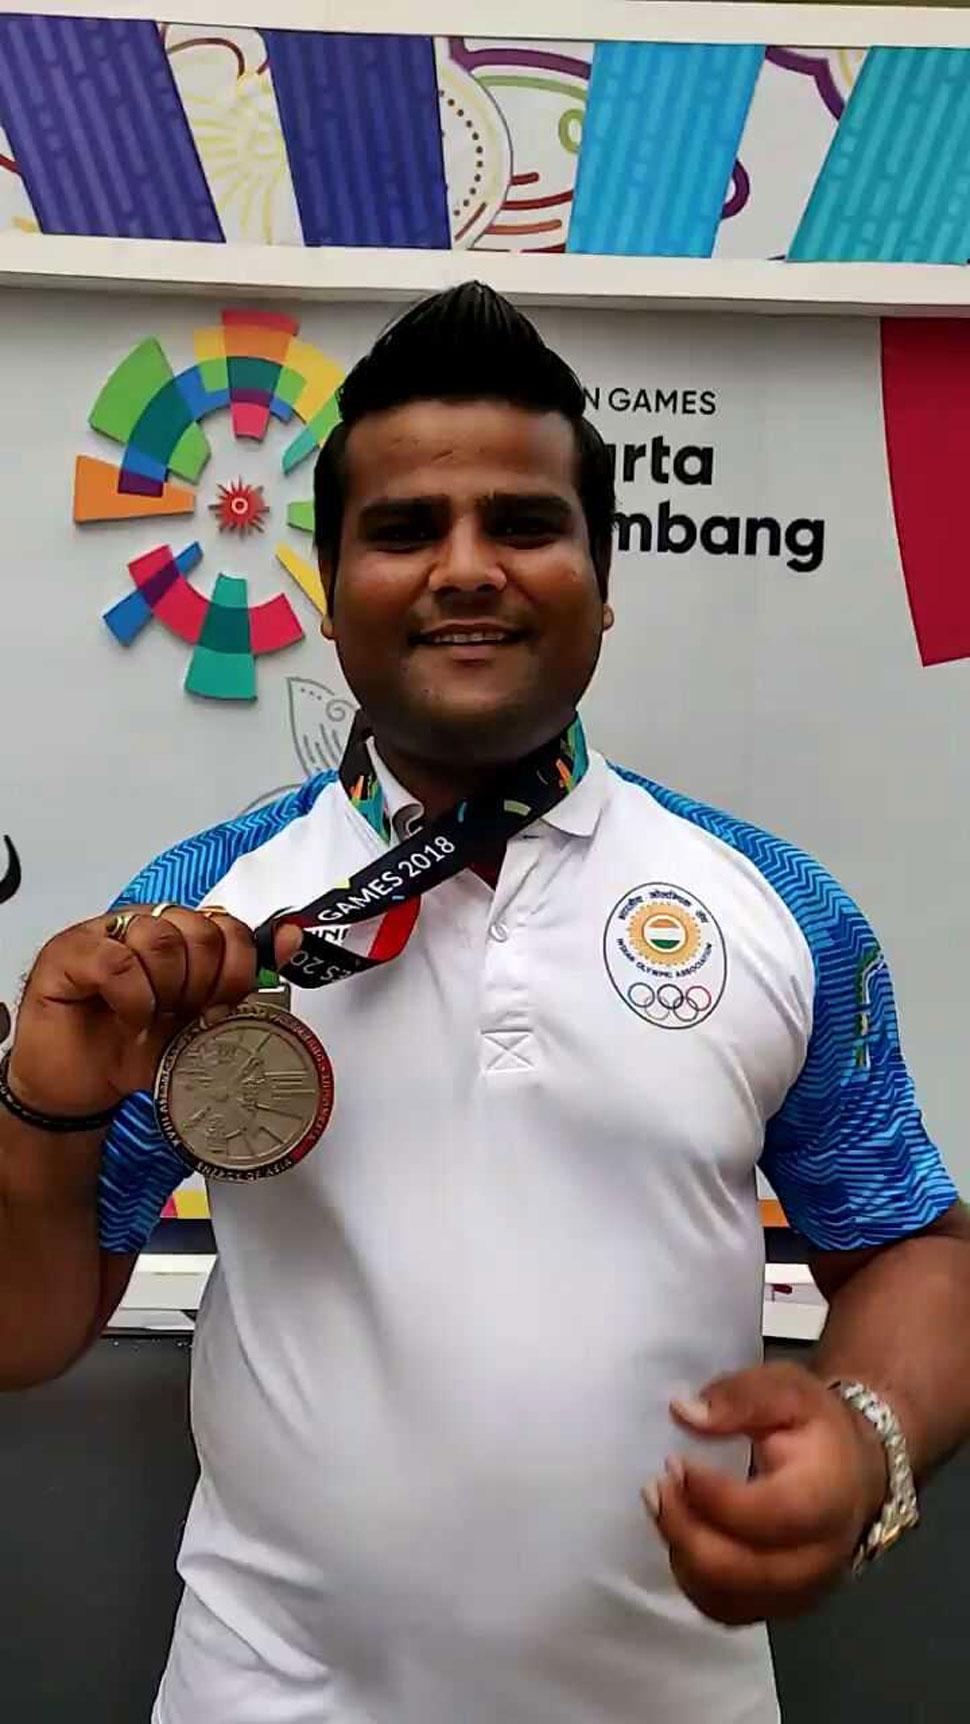 Rajat Chauhan, Archery, Asian Games 2018